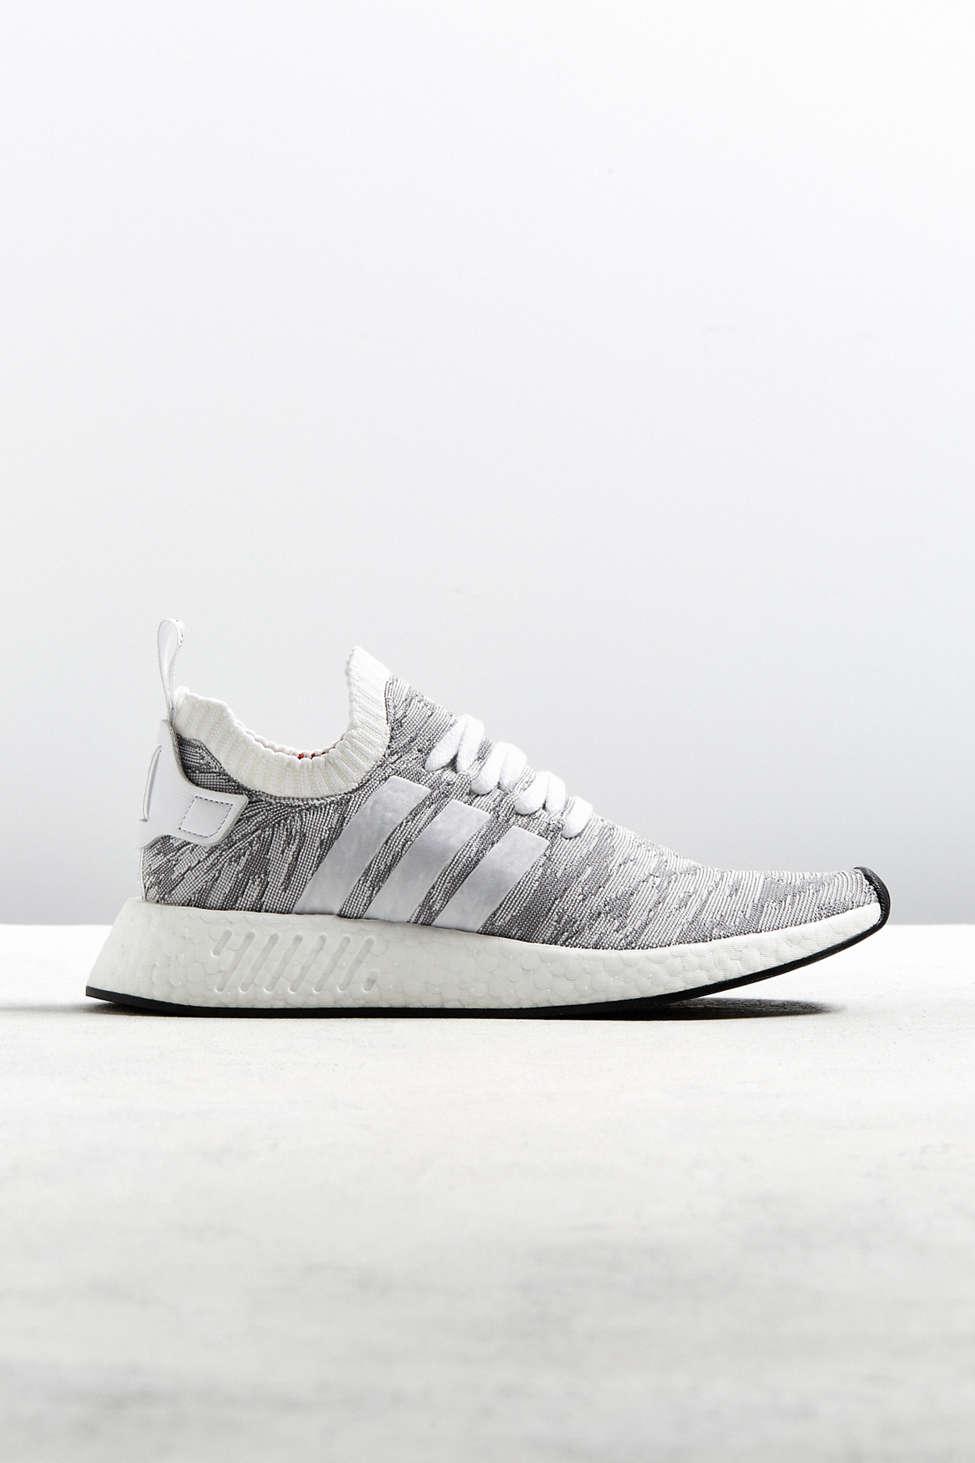 adidas nmd r2 primeknit melange scarpe urban outfitters